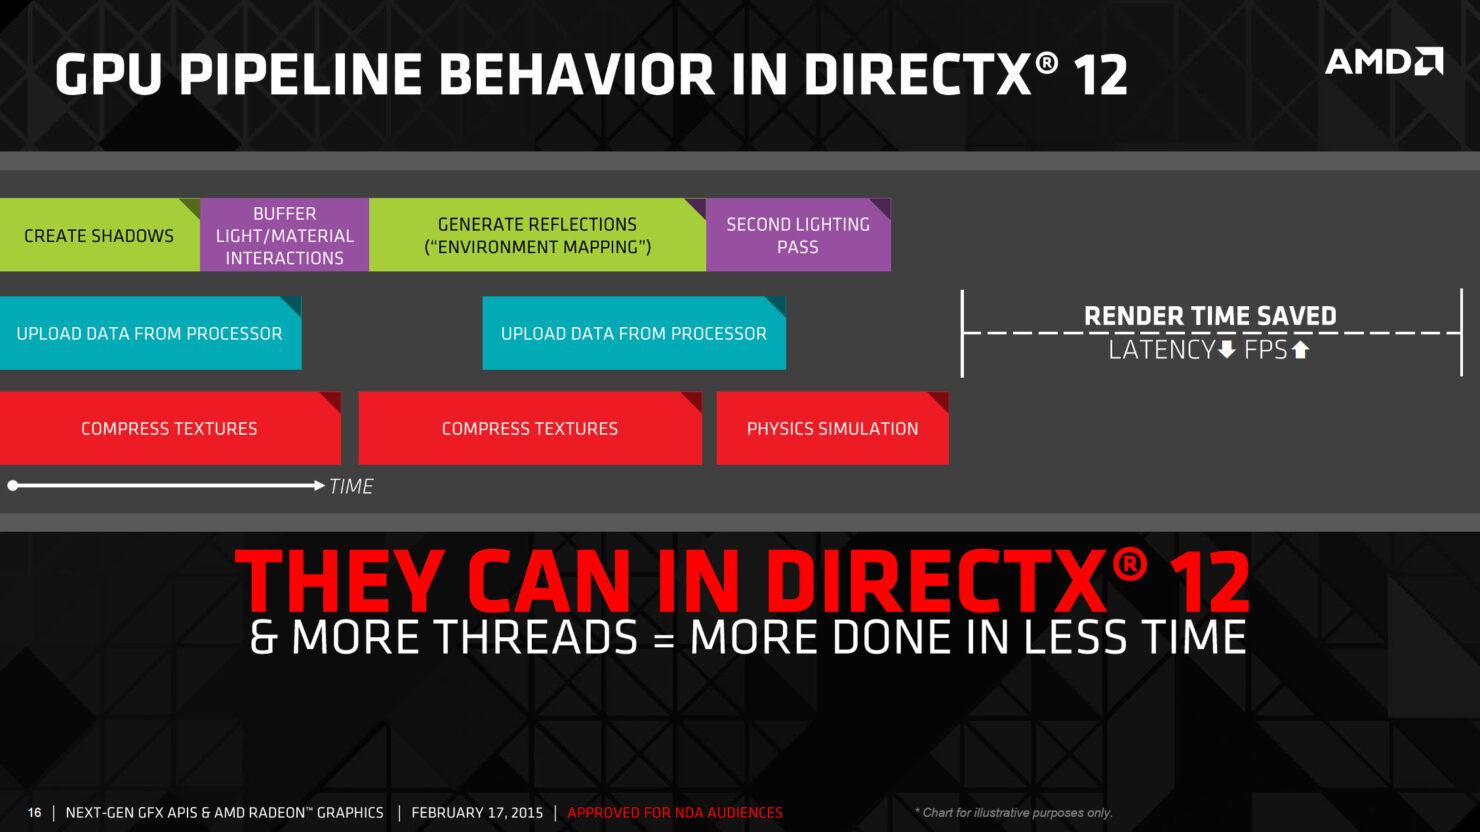 amd-gpu-pipeline-directx-12